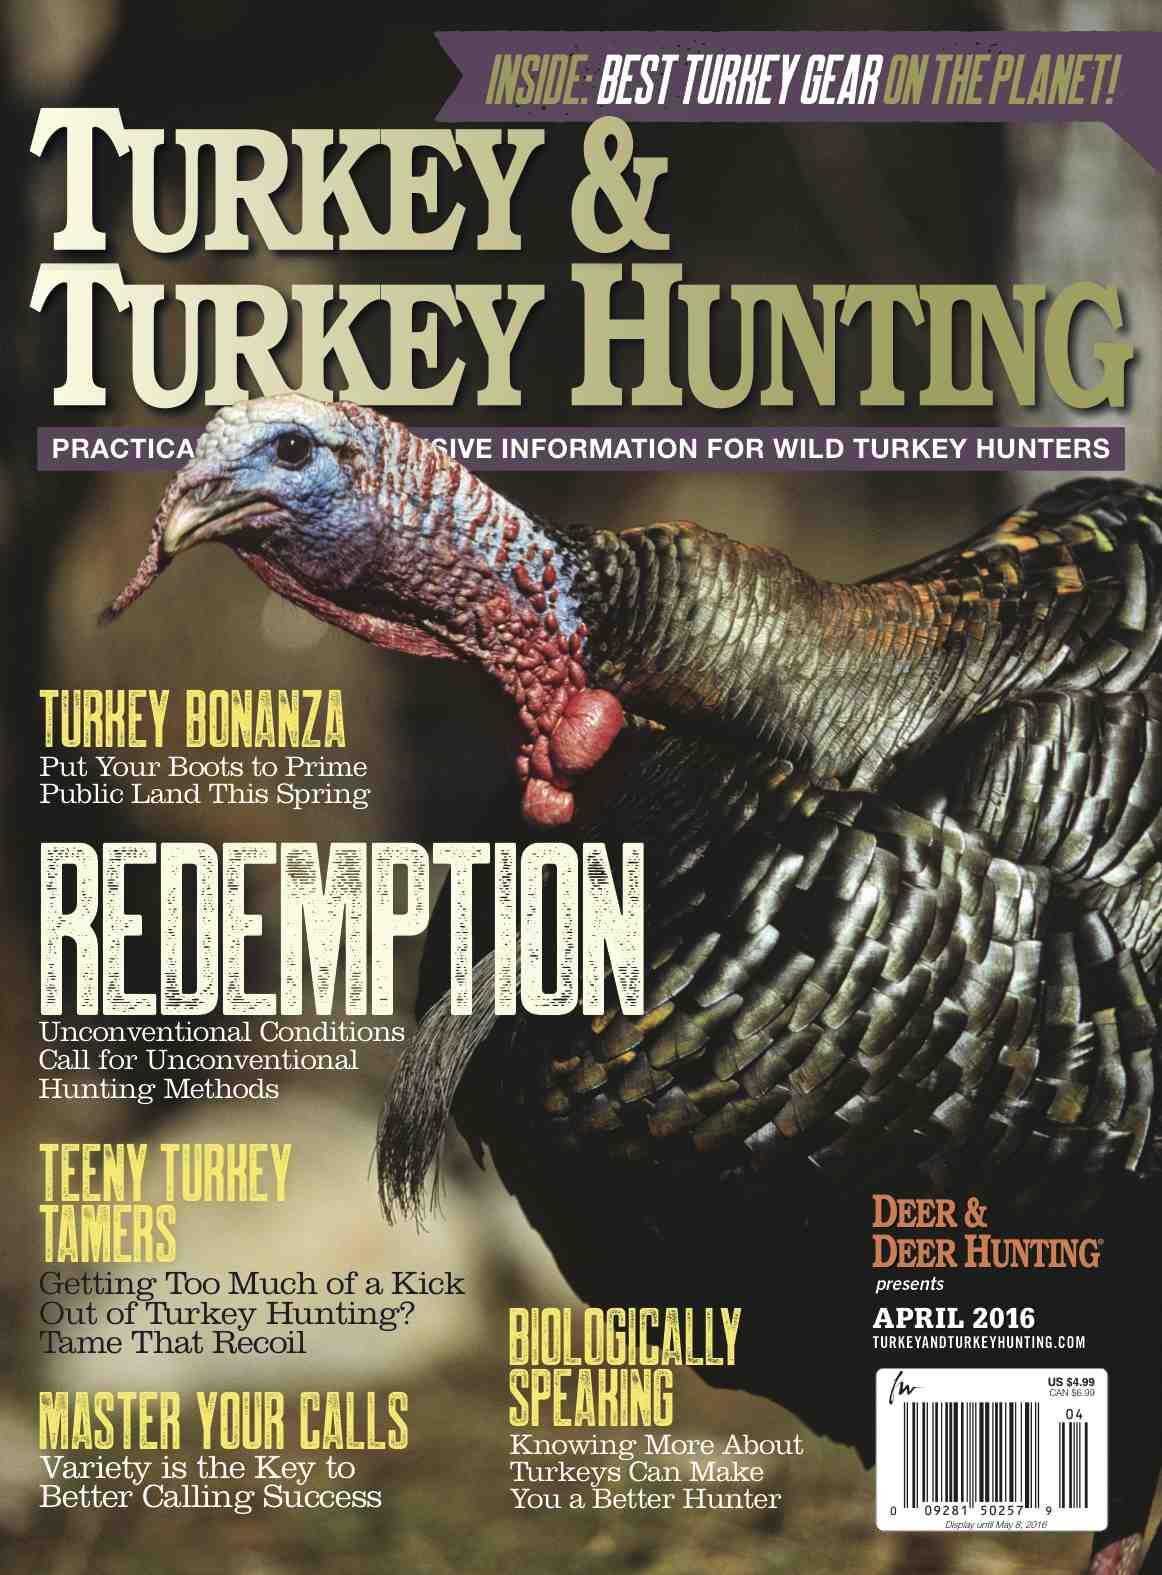 Launch Your Spring Season with Turkey & Turkey Hunting Magazine - Deer & Deer Hunting | Whitetail Deer Hunting Tips